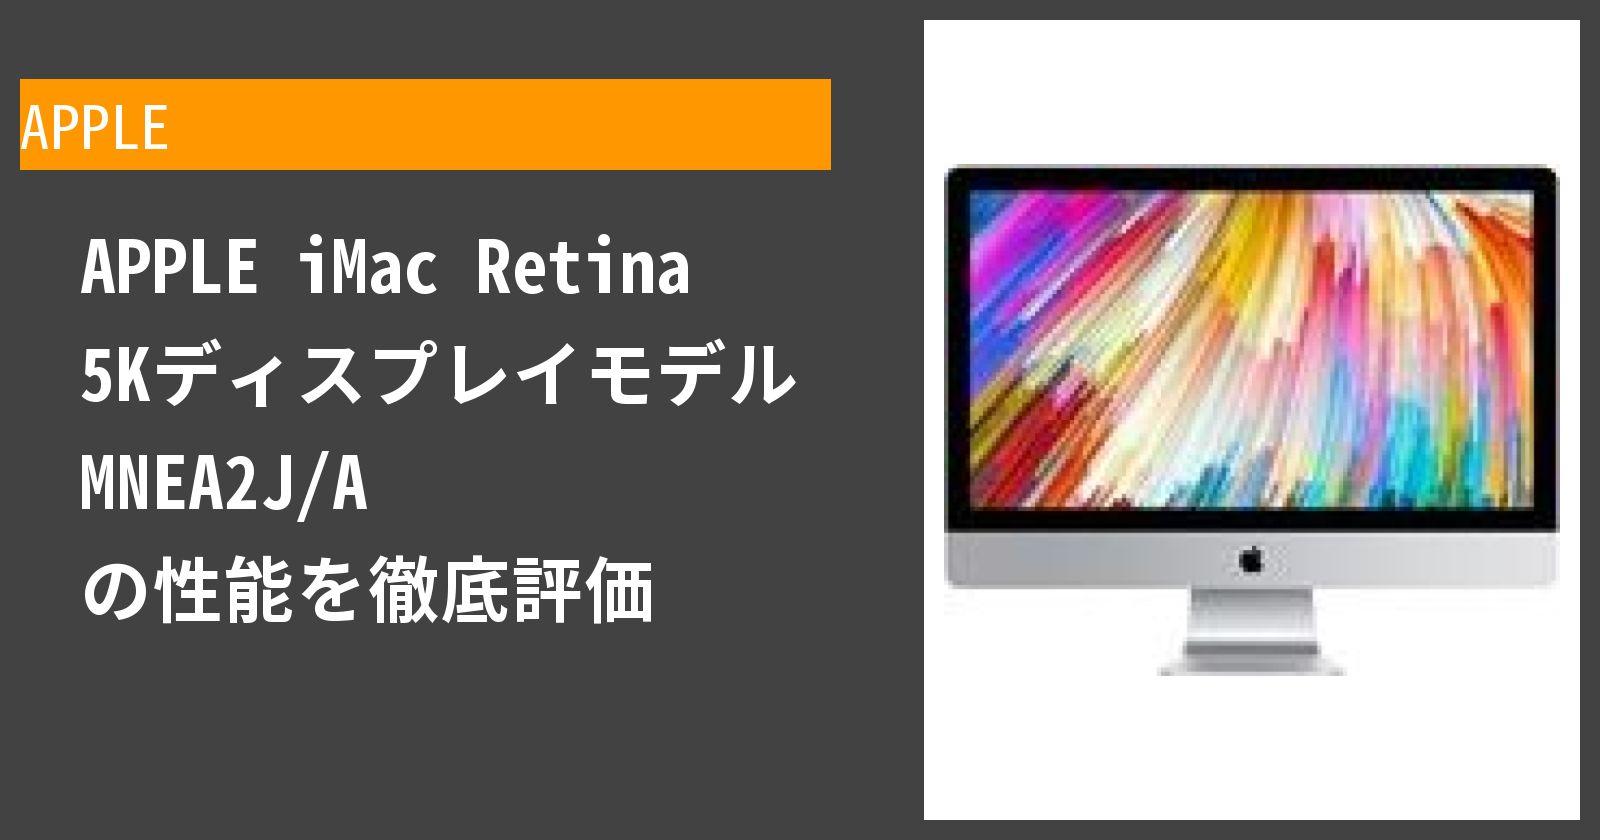 iMac Retina 5K(MNEA2J/A) の性能を徹底評価